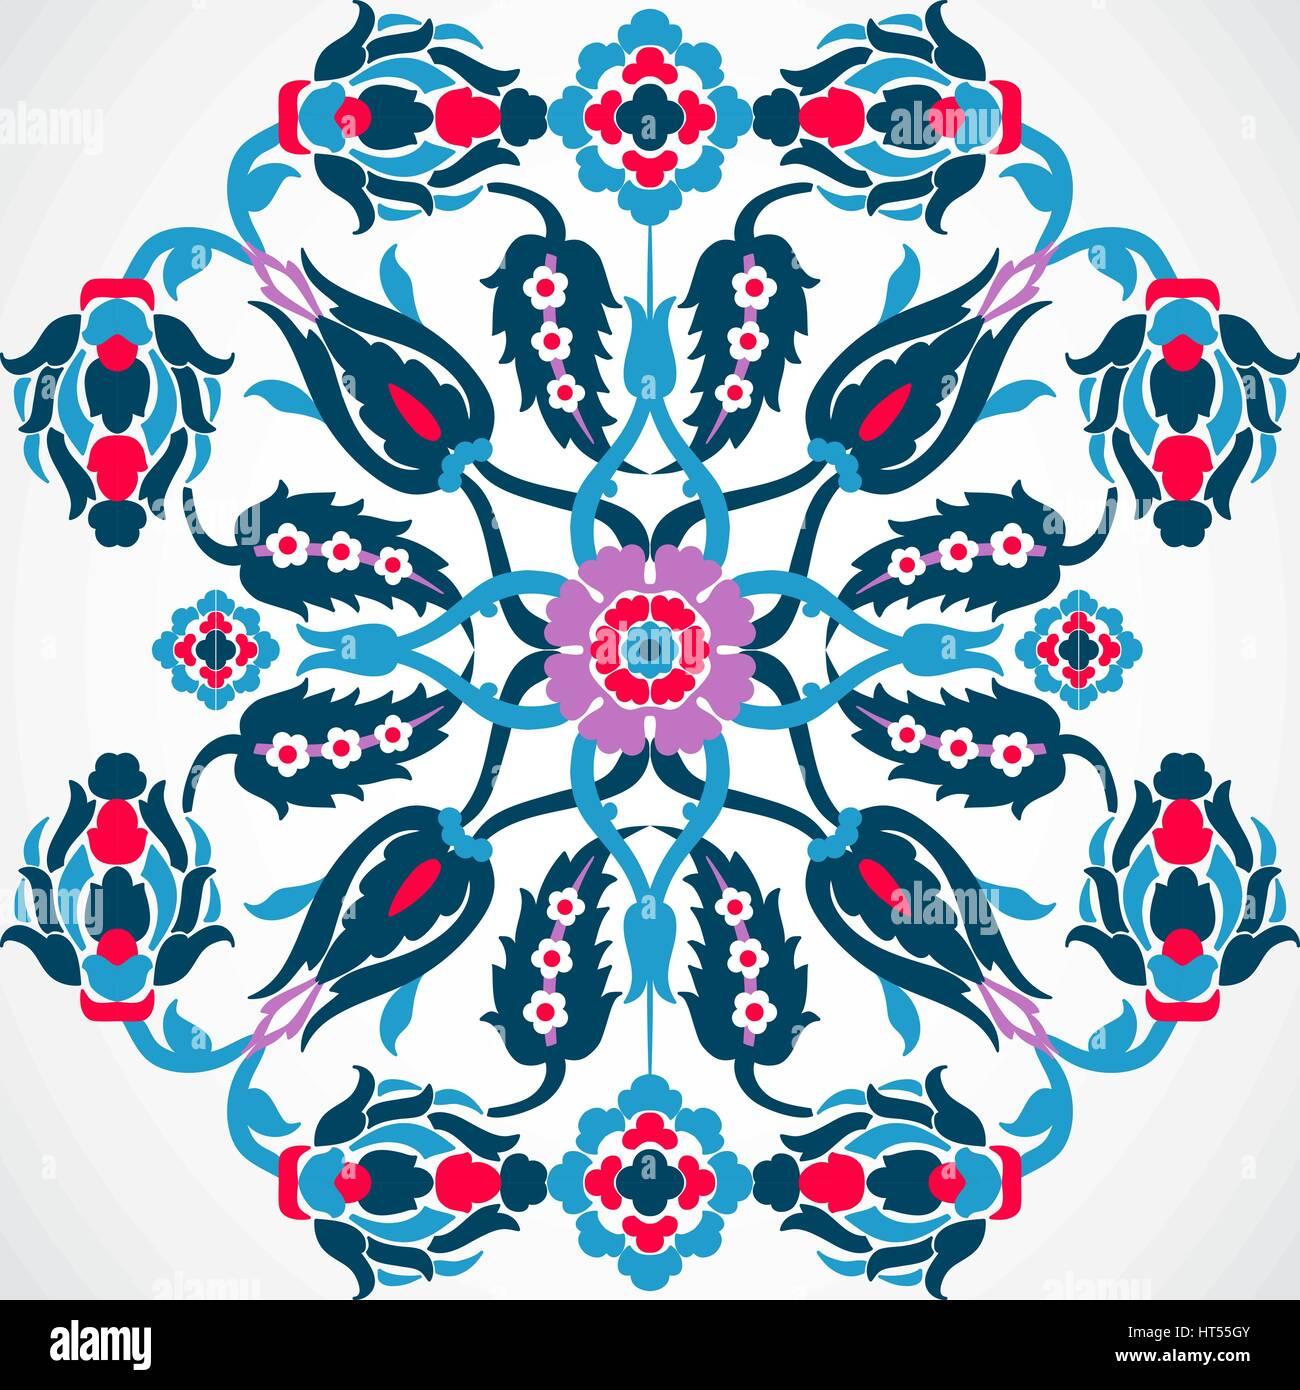 bcdaedc02cf2 Arabesque vintage frame border for design template vector. Eastern style  pattern. Elegant floral decoration print. Ornamental illustration for  invitat